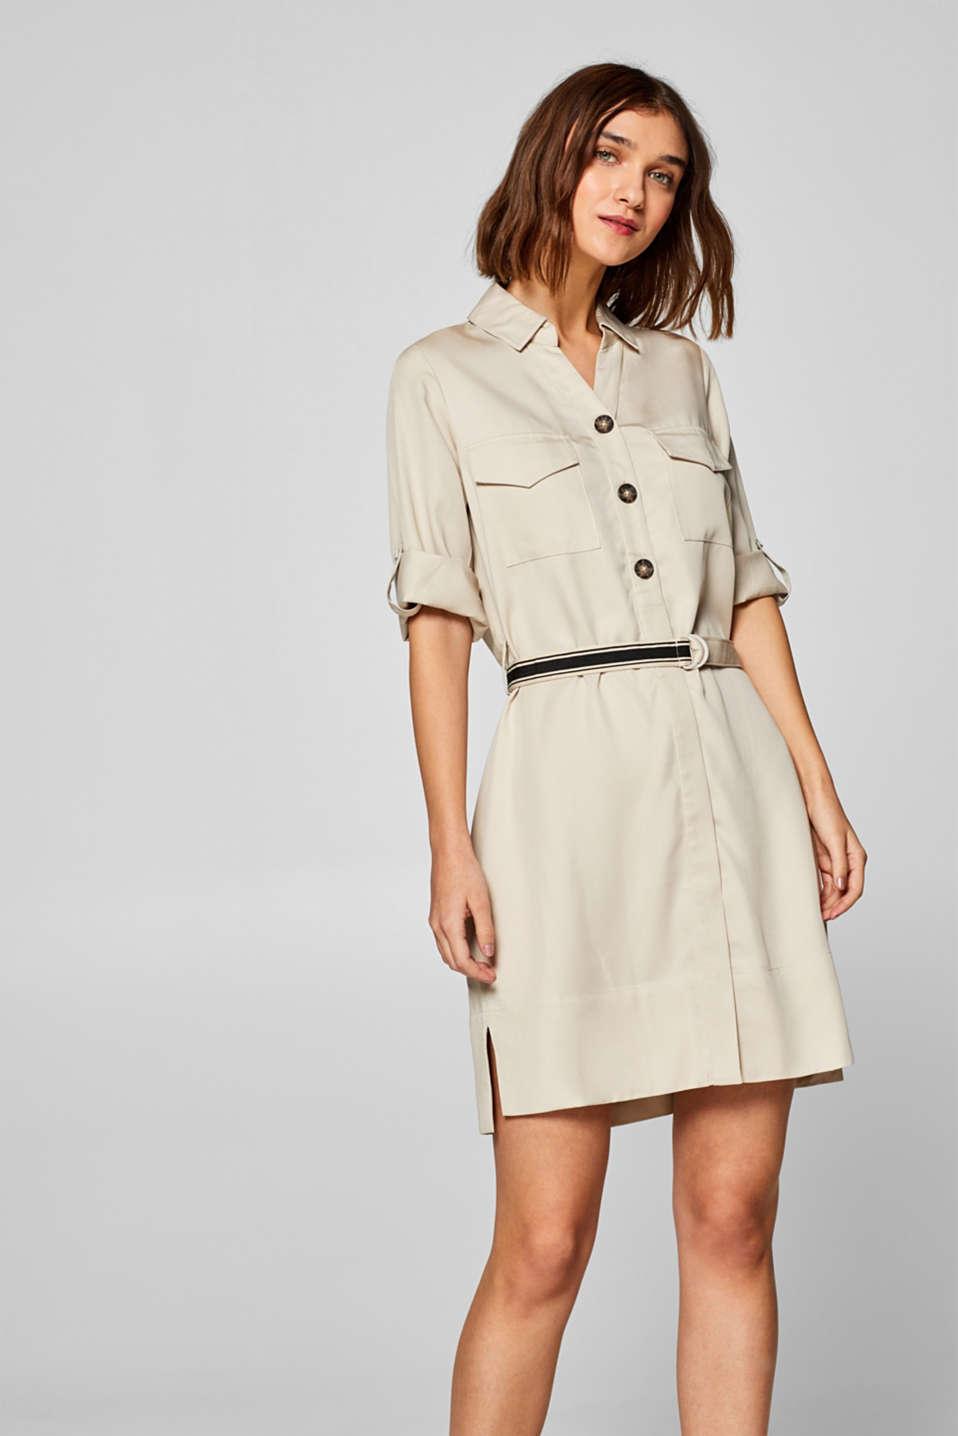 a1b180f0c171 Esprit - Skjortblusklänning i 100% lyocell i Esprits Online-Shop